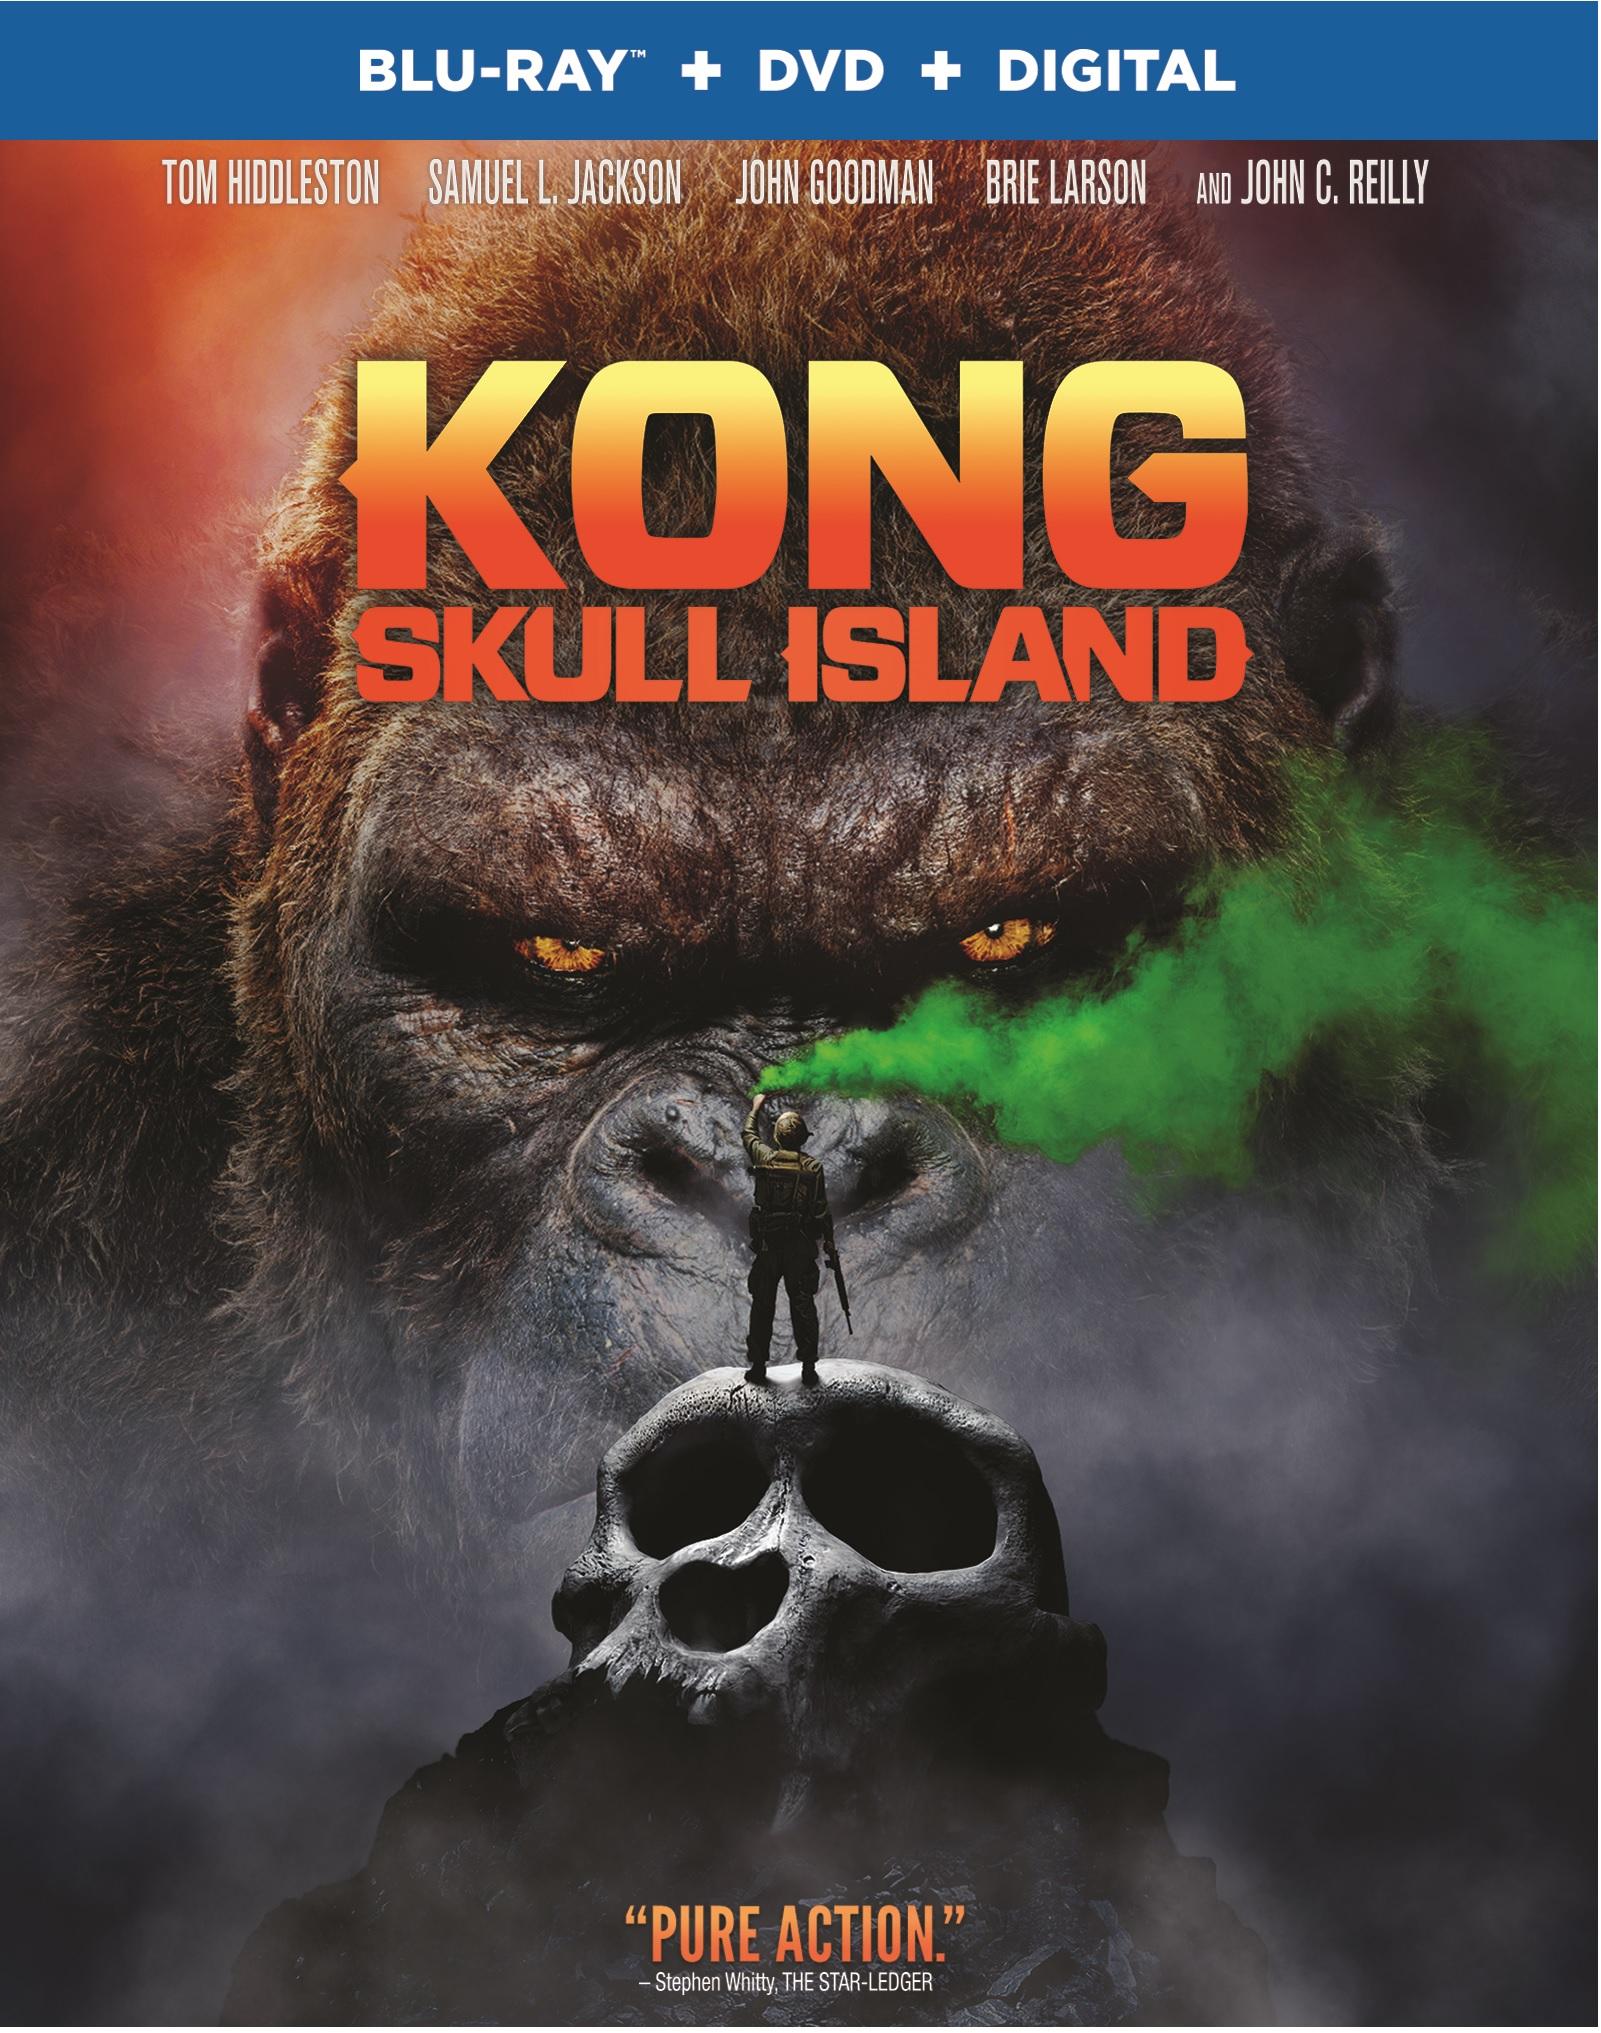 Kong Skull Island Blu-ray Review